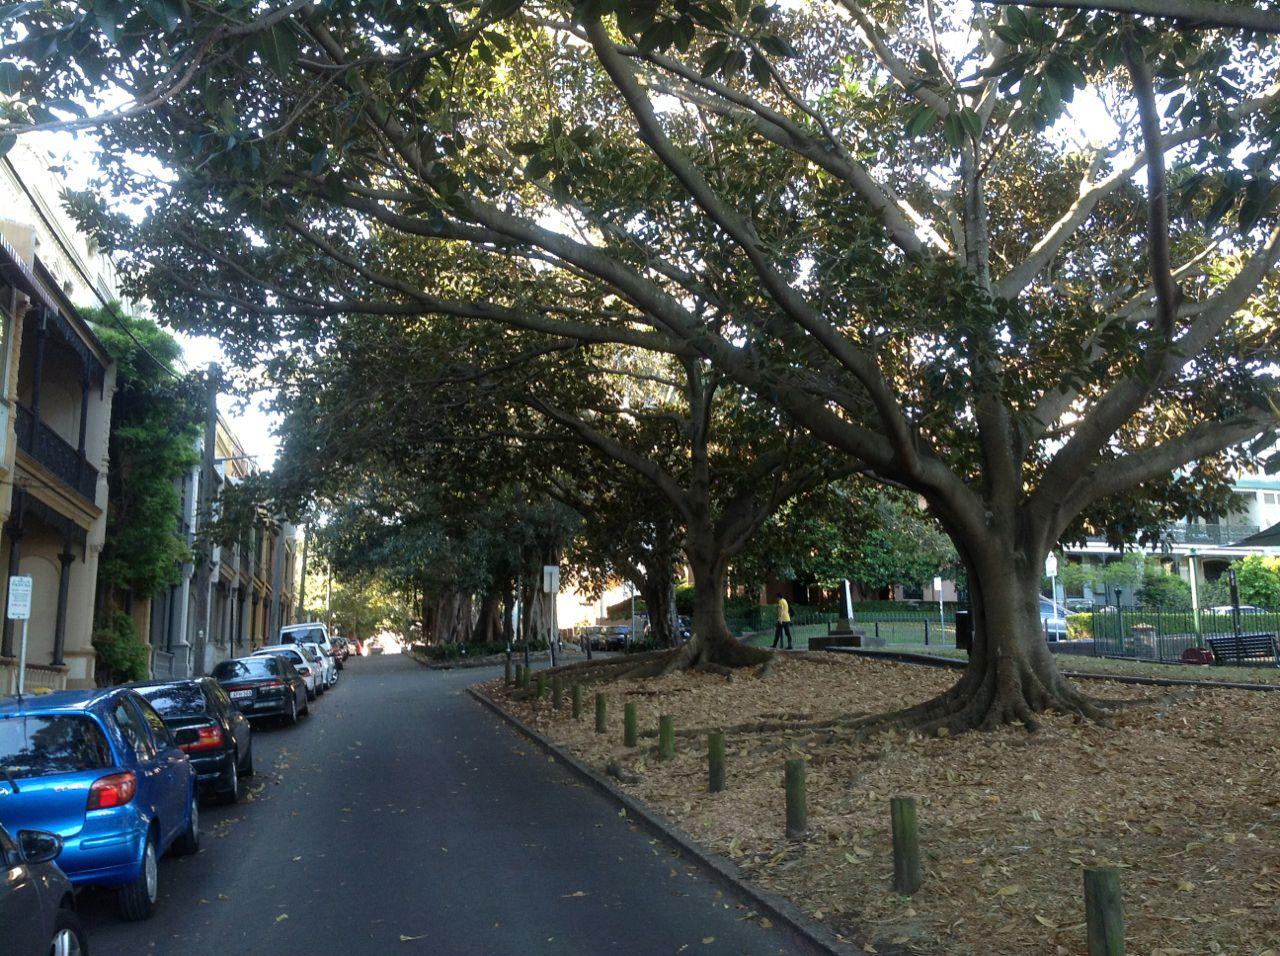 Moreton Bay Figs and Port Jackson Figs